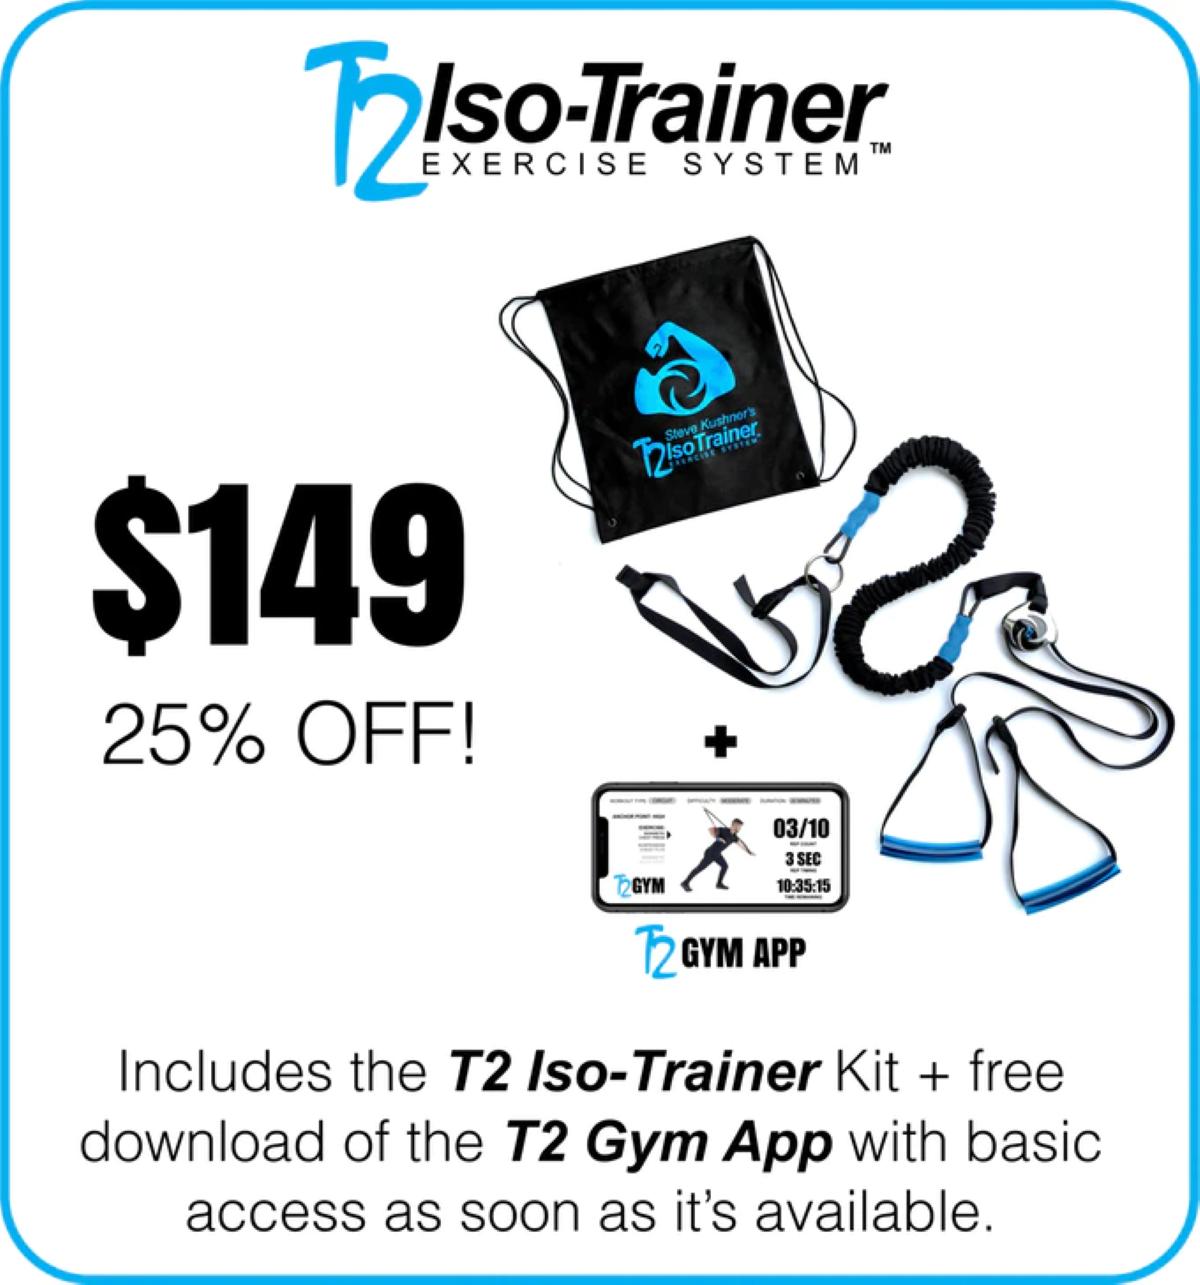 T2 Iso-Trainer - $150 Crowdfunding Pledge Set